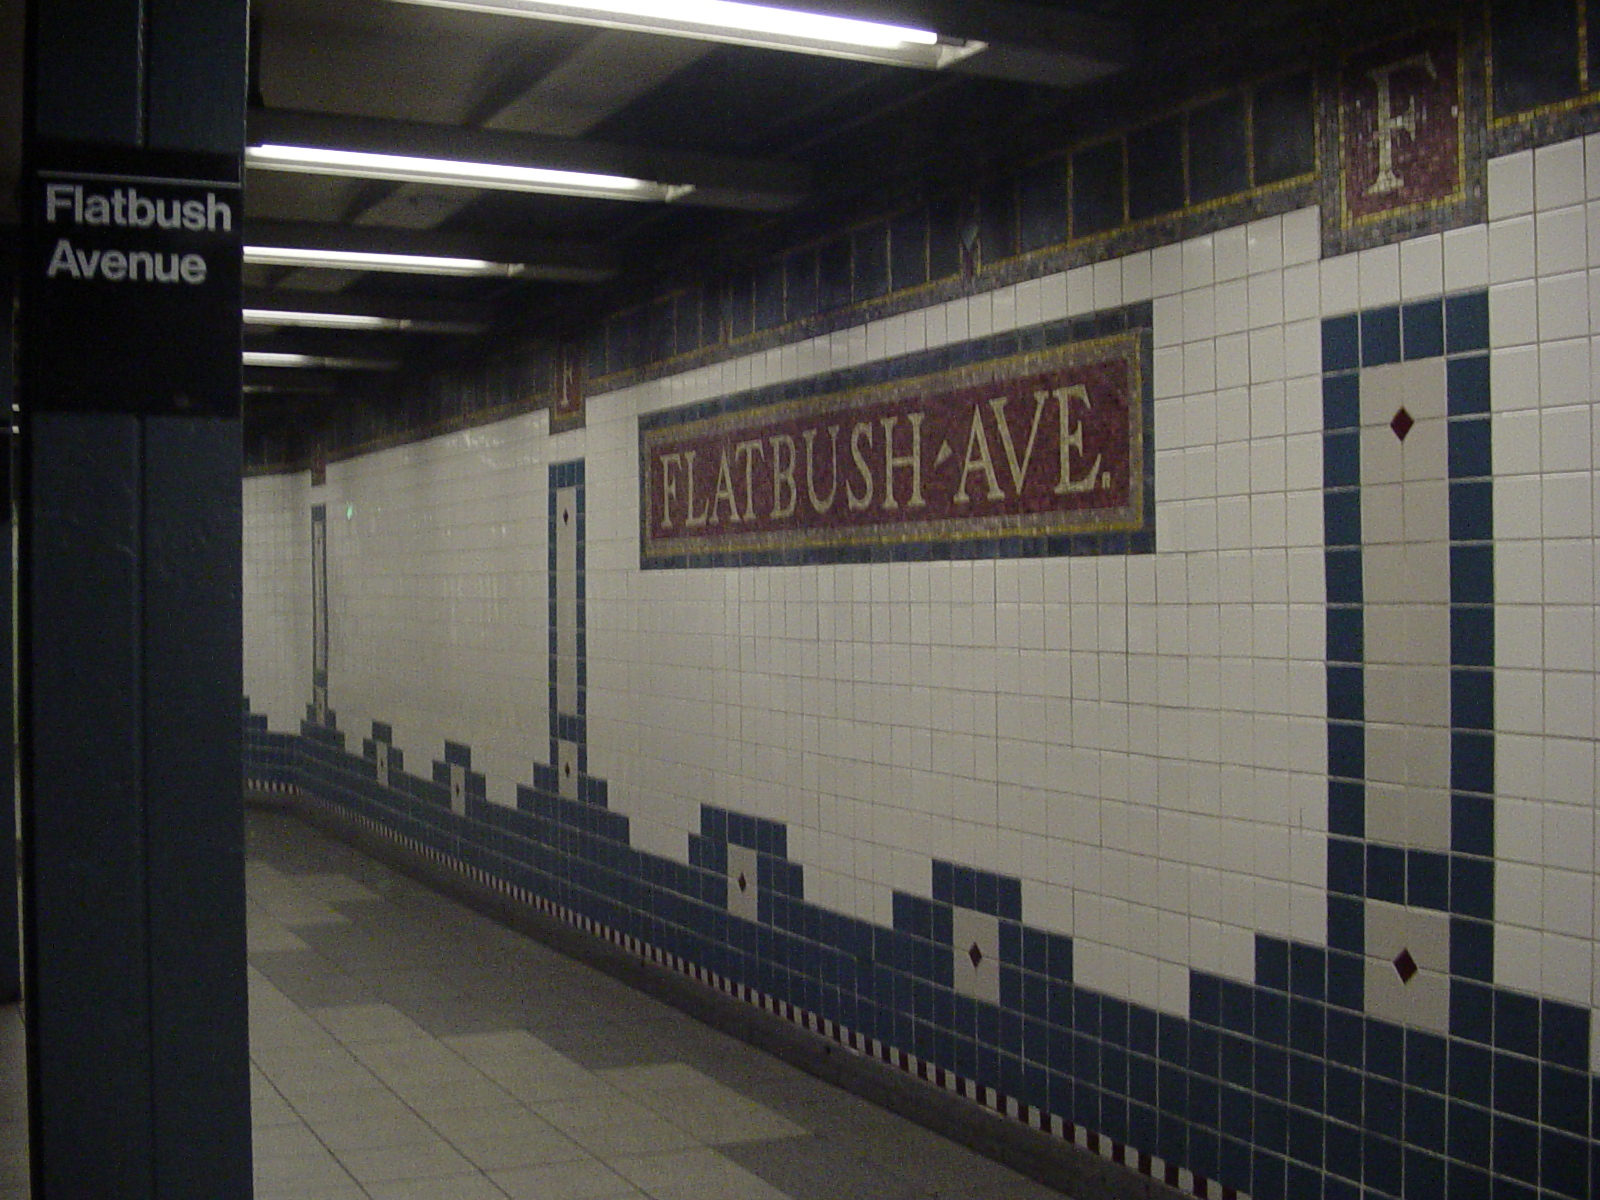 Subway Tile File Flatbush Avenue Brooklyn College Tile Jpg Wikimedia